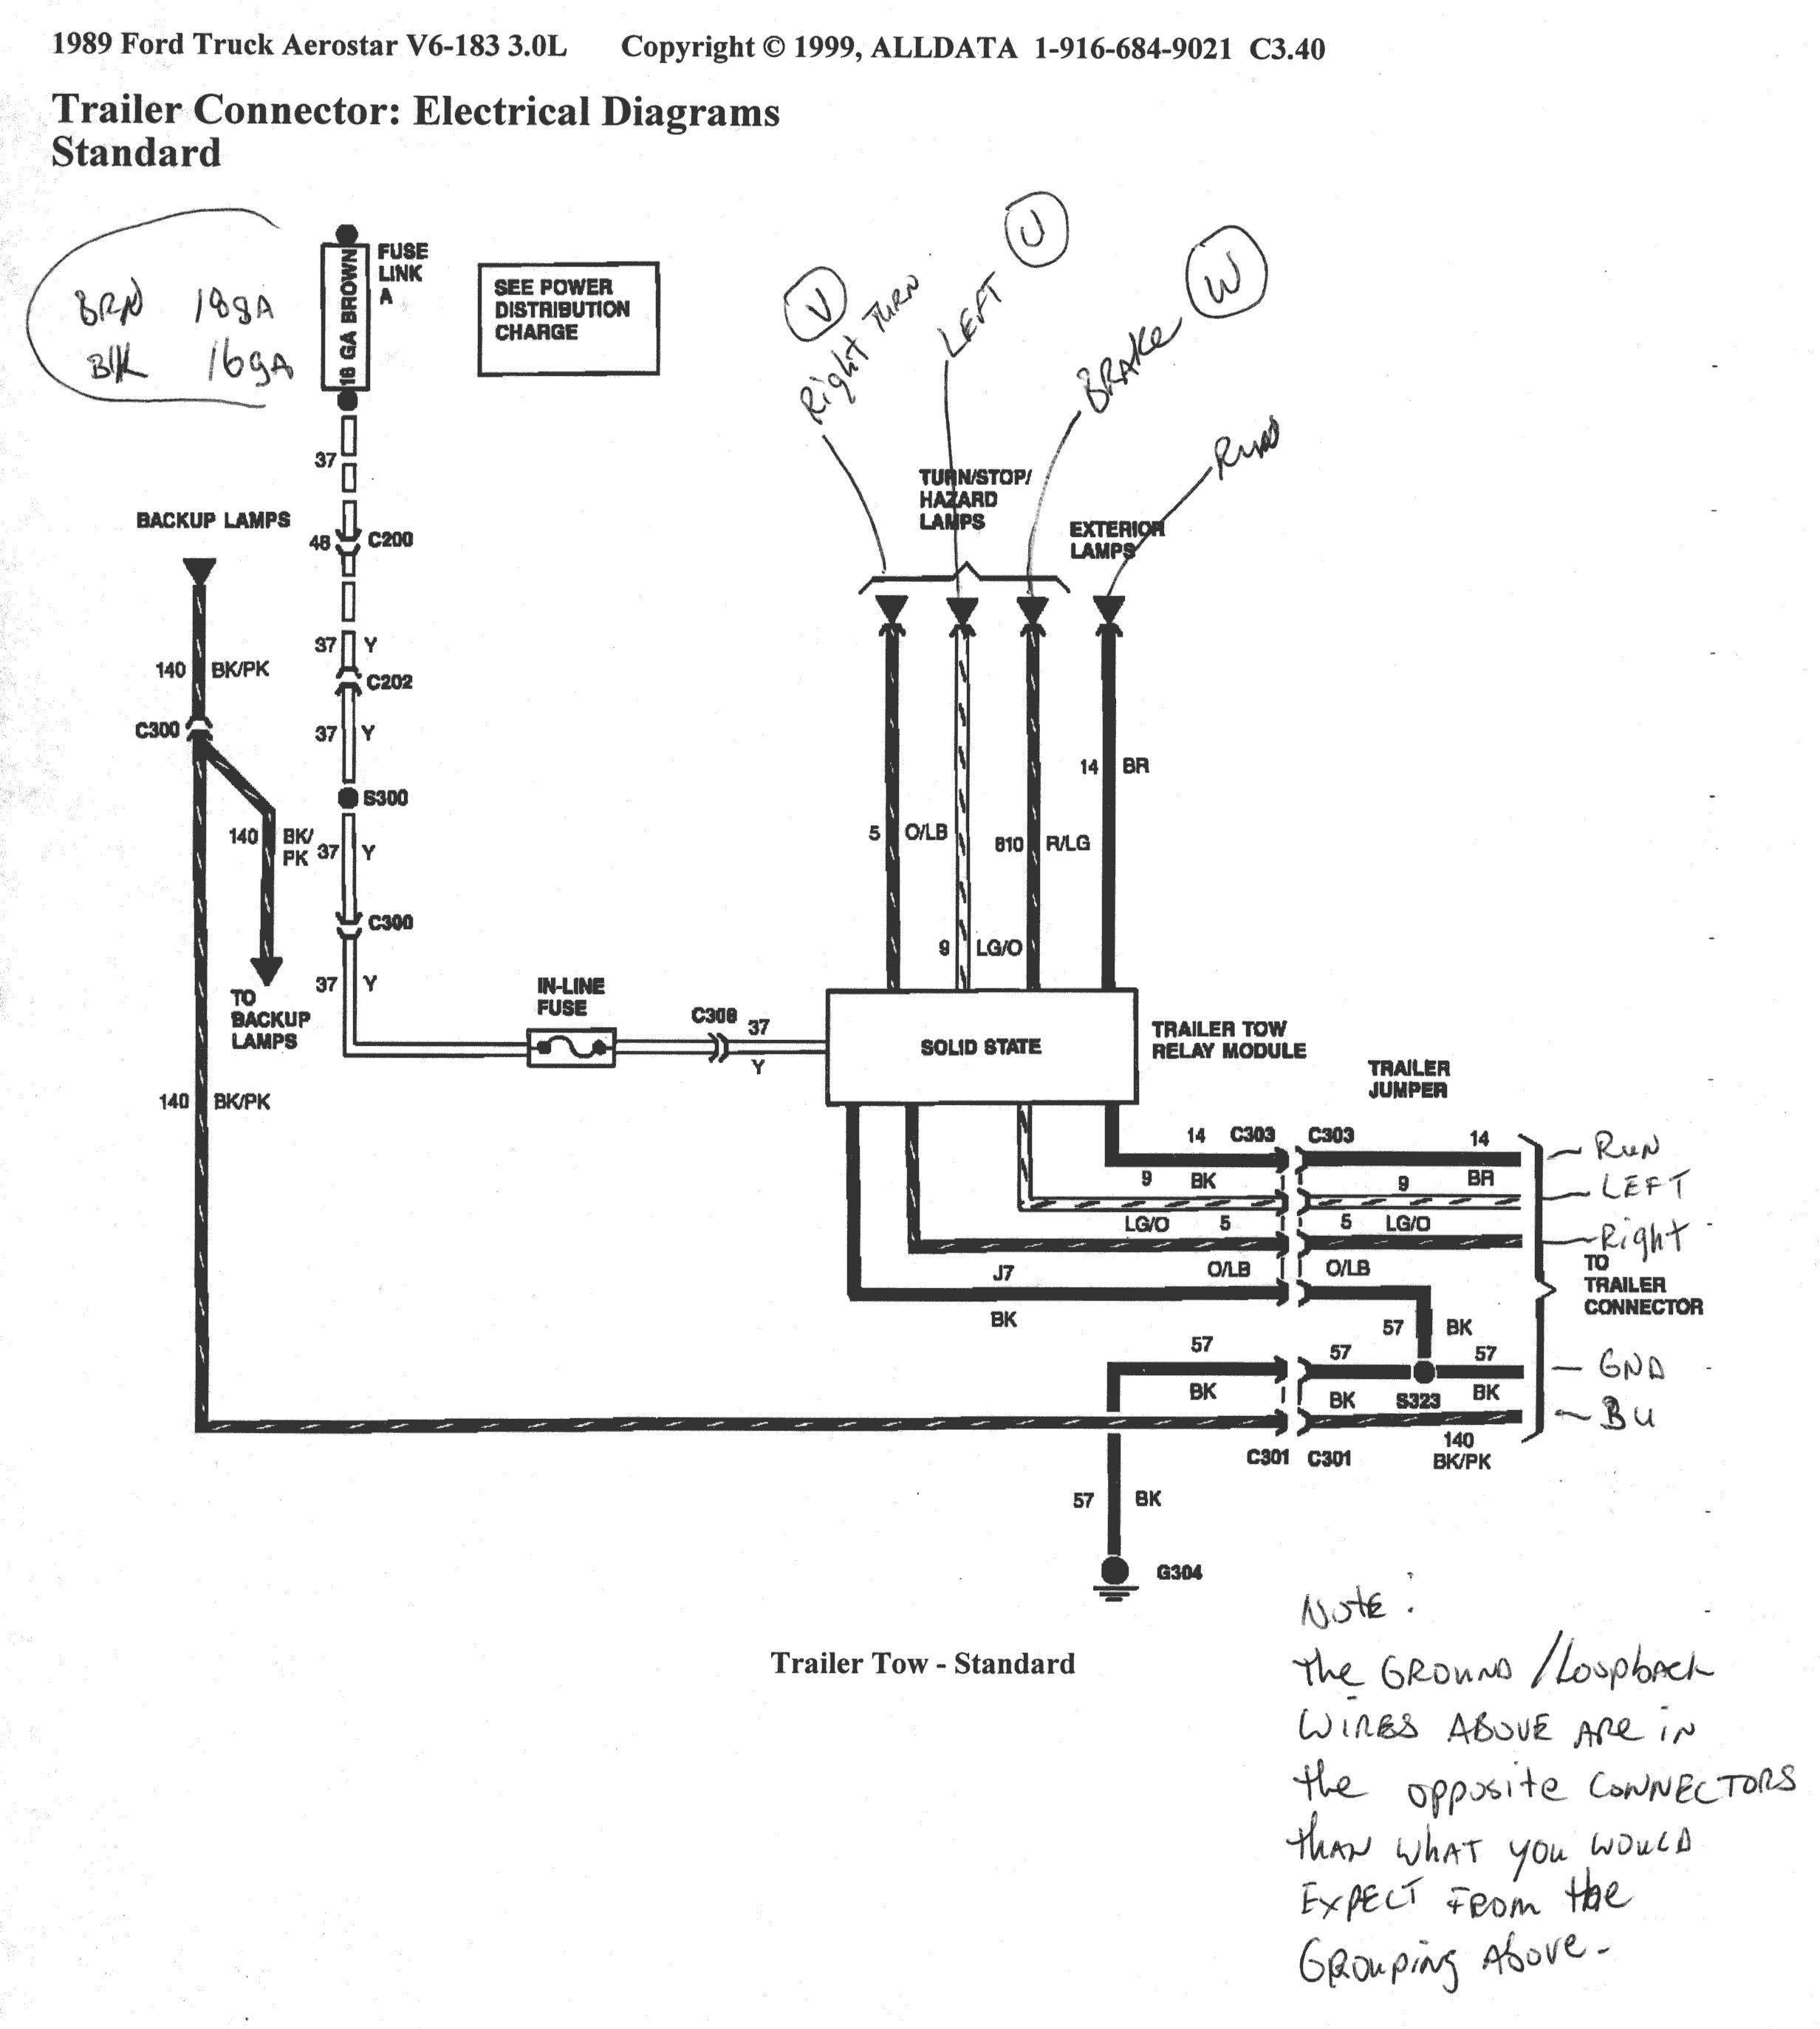 1984 Ranger Wiring Diagram Trusted Wiring Diagram Trailer Wiring Diagram Diagram Ford